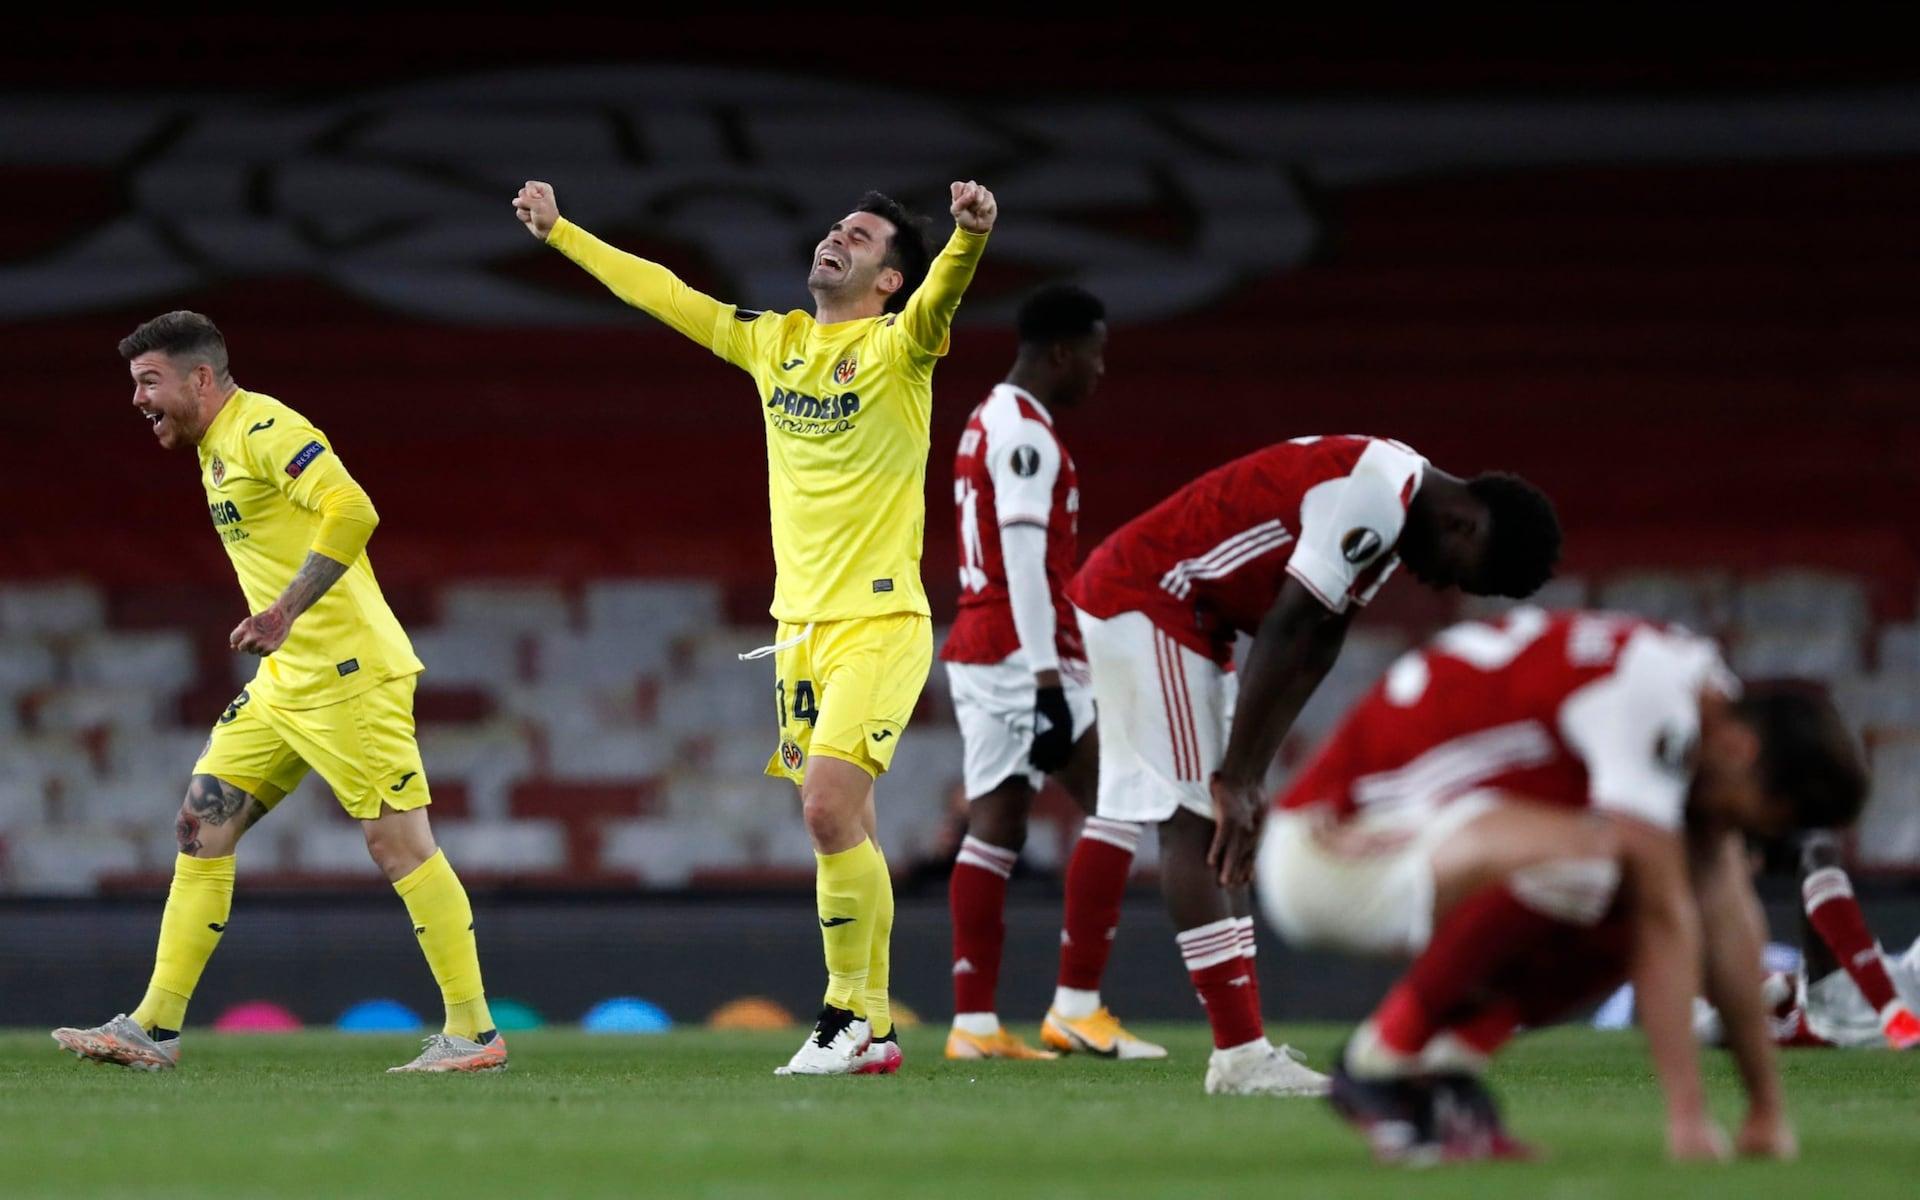 Emery berpikir Villarreal mengatasi ketidakadilan untuk mengalahkan Arsenal di semifinal, tetapi tidak beruntung.  Foto: AP